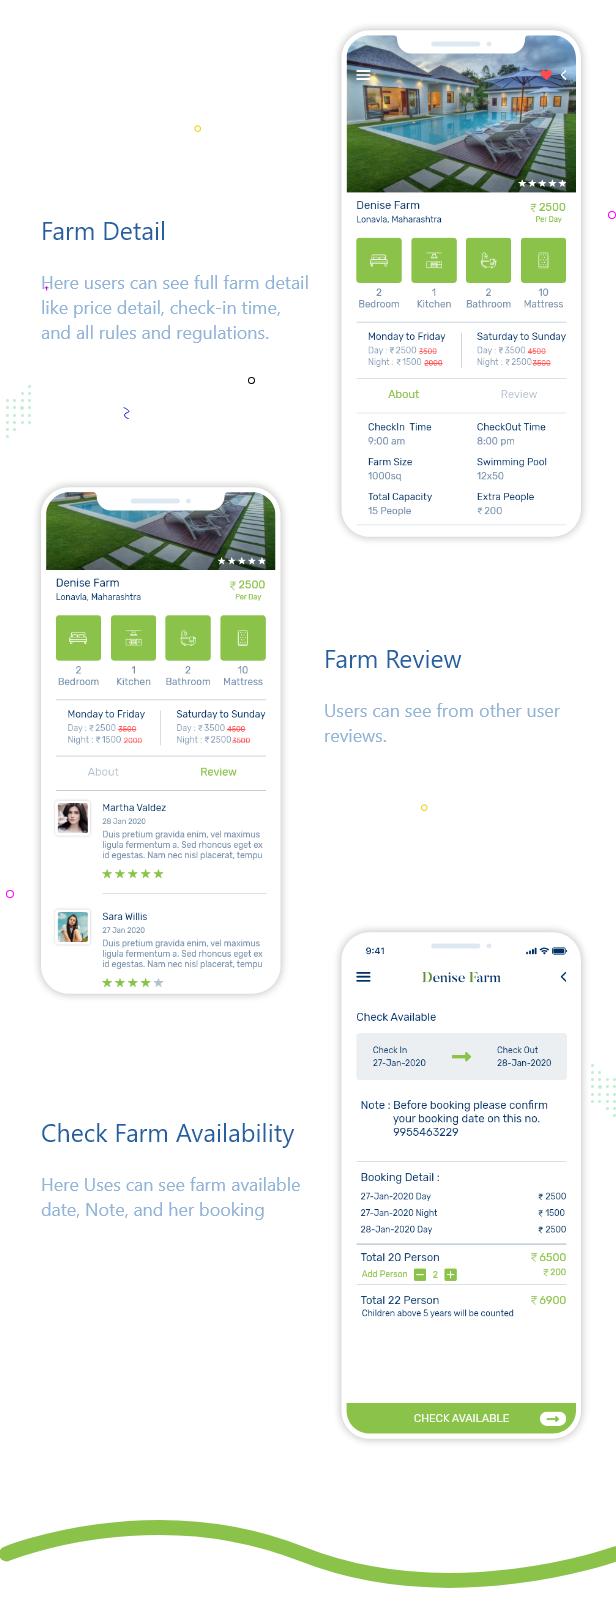 Farmvilla-Property-farmhouse-booking-app-and-admin-panel-marketplace-8